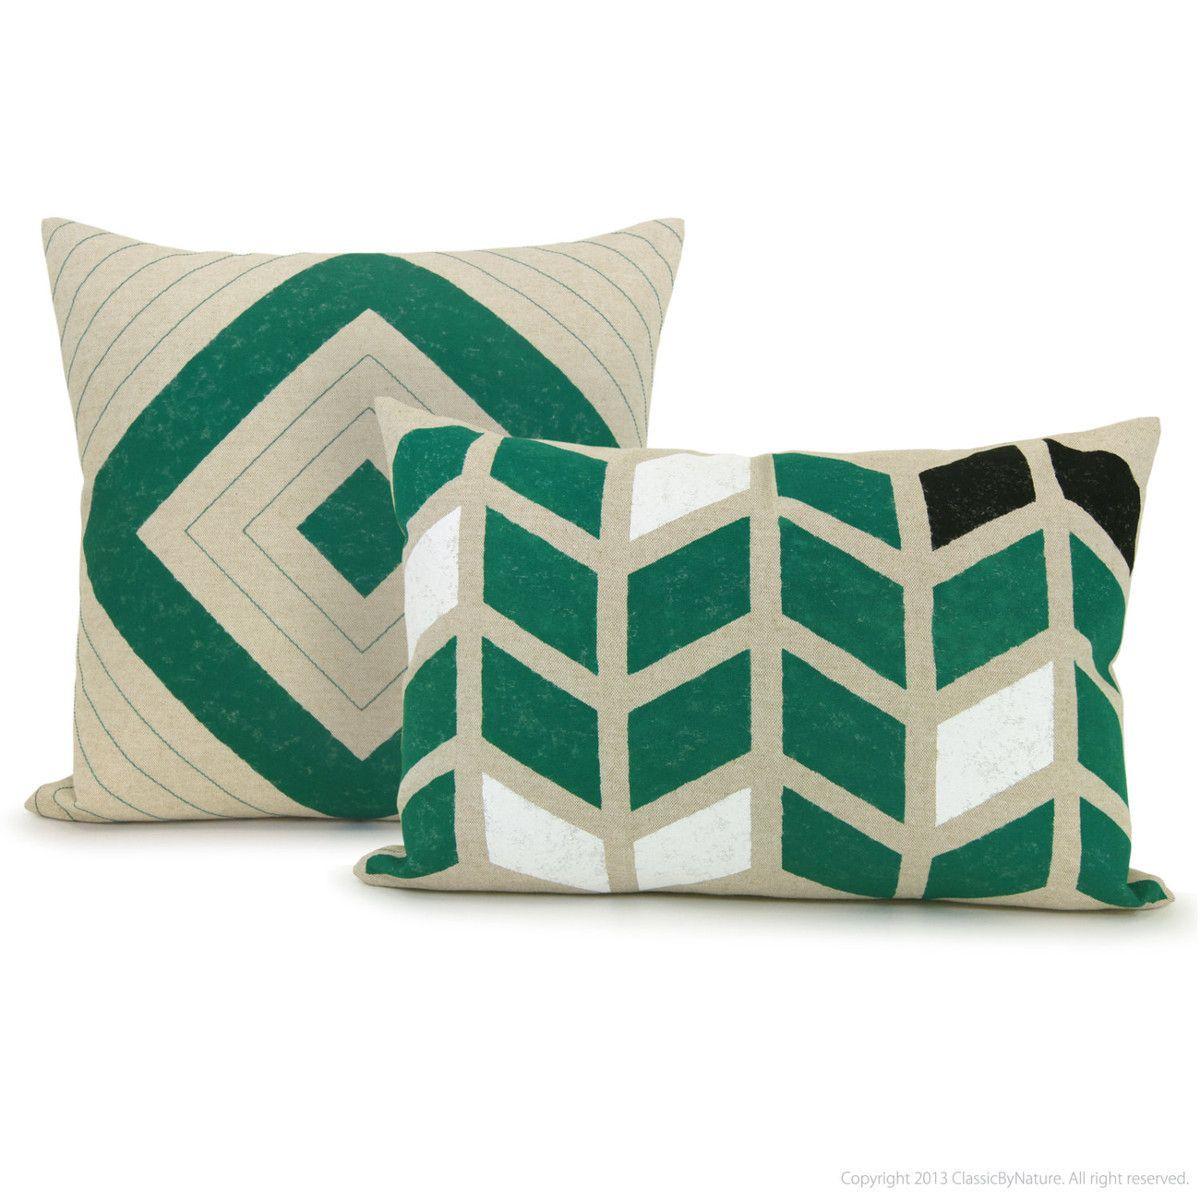 Chevron pillow cover geometric herringbone hand printed arrows in